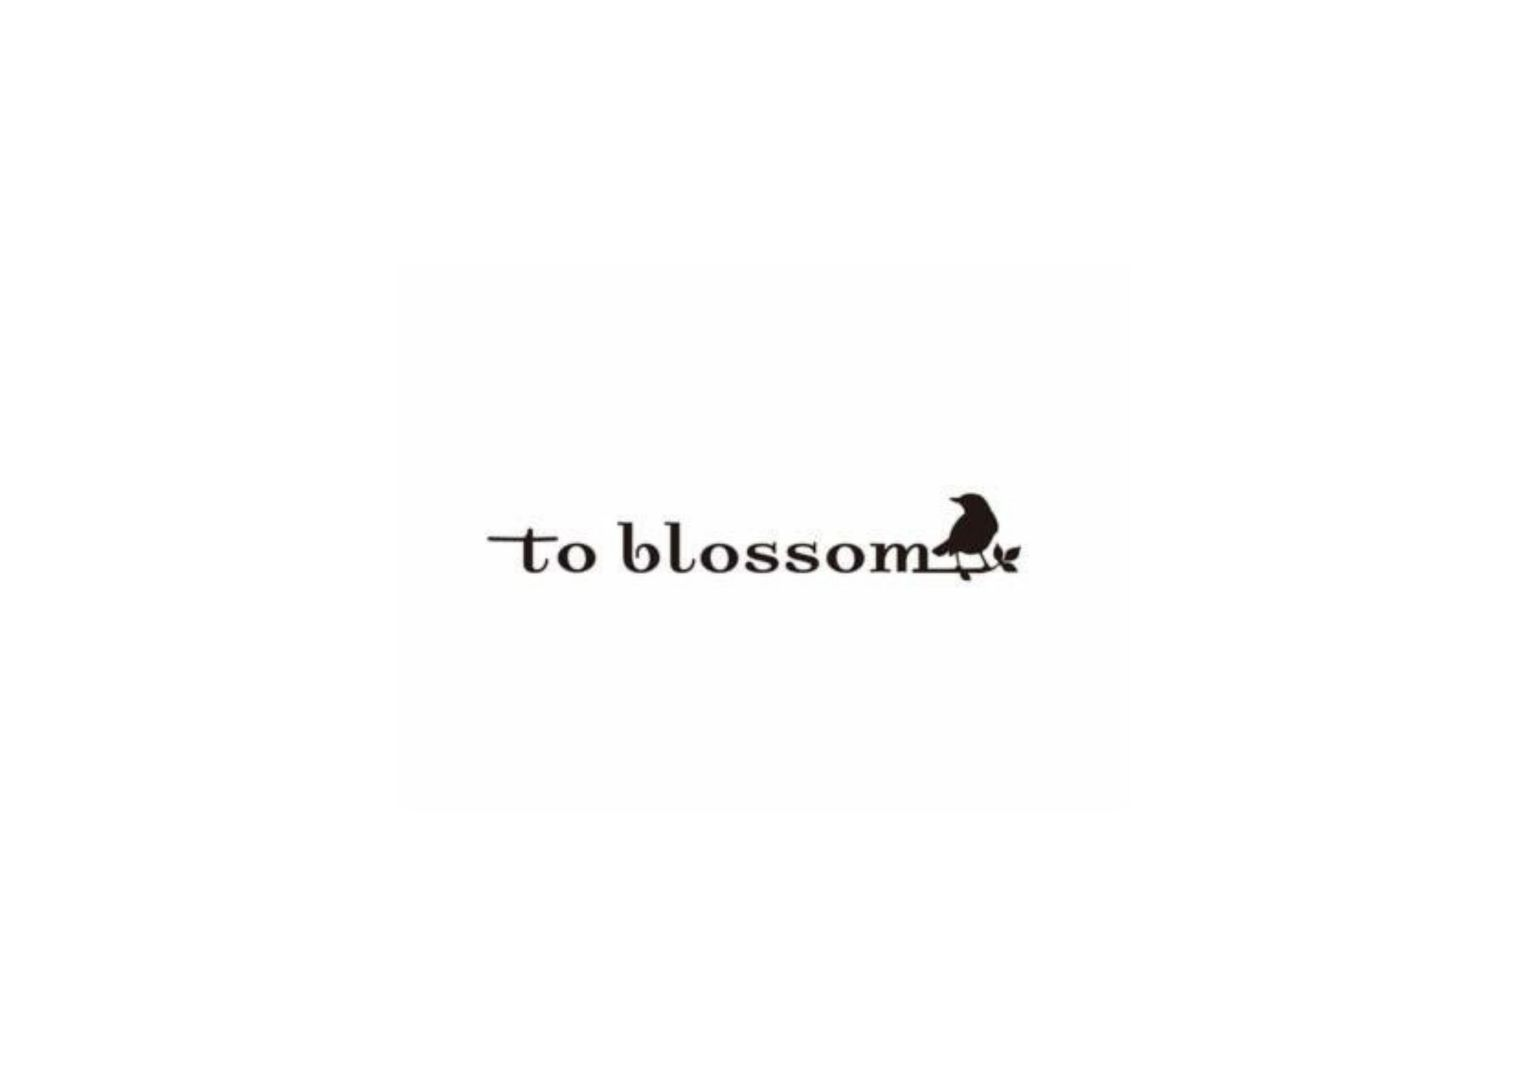 to blossom イオンモール名取店 店長候補募集! / TRFT10011のカバー写真